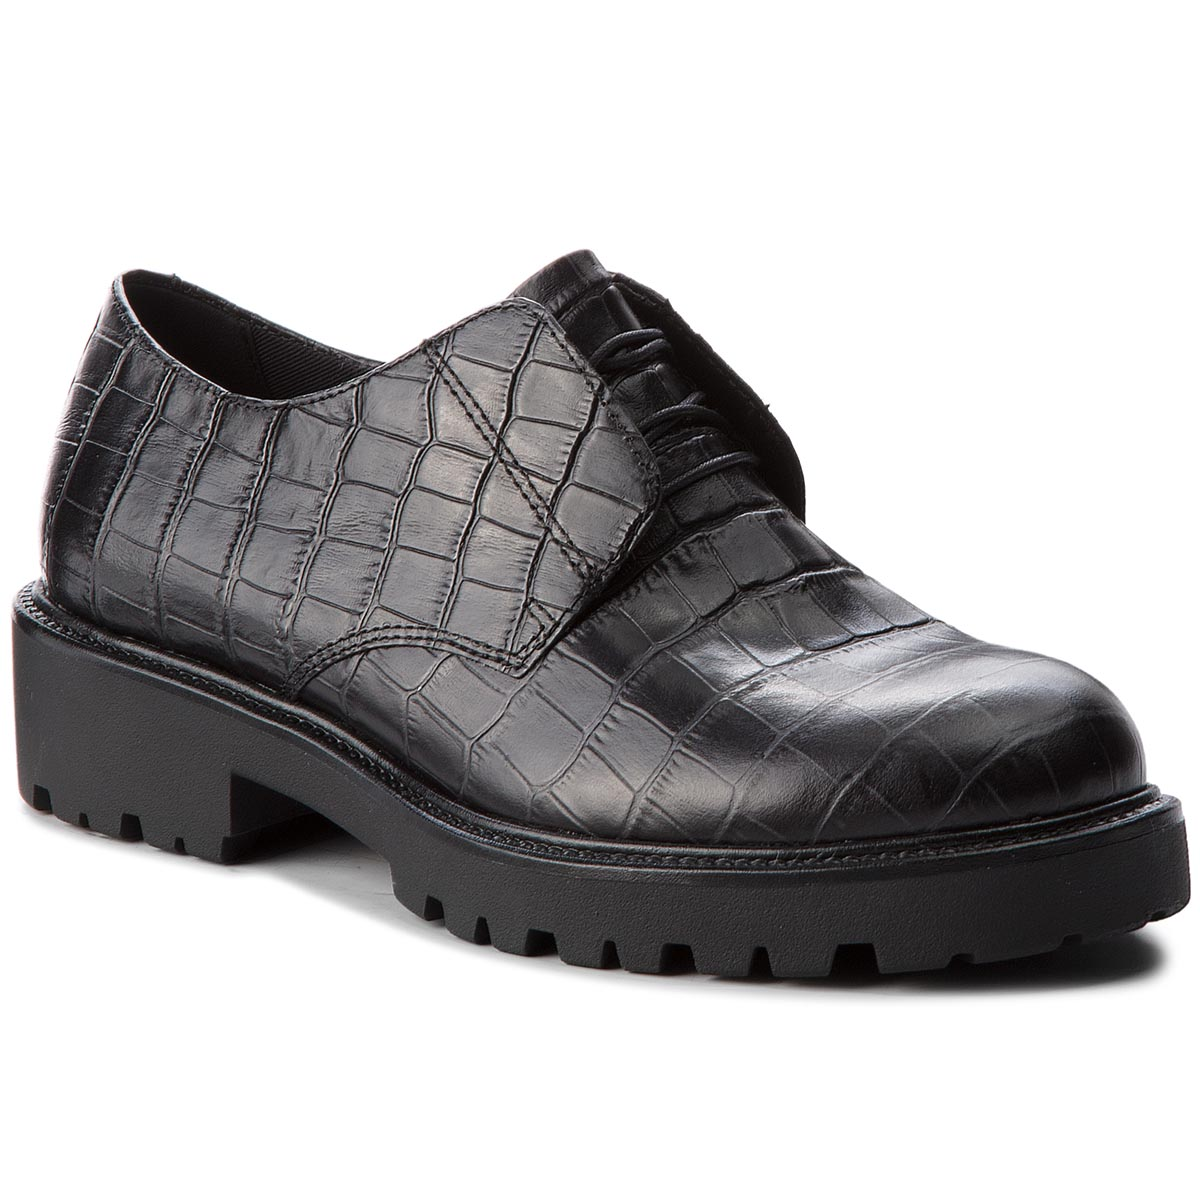 c1018208f0 Ankle Boots VAGABOND - Kenova 4441-701-20 Black - Elastic-sides ...